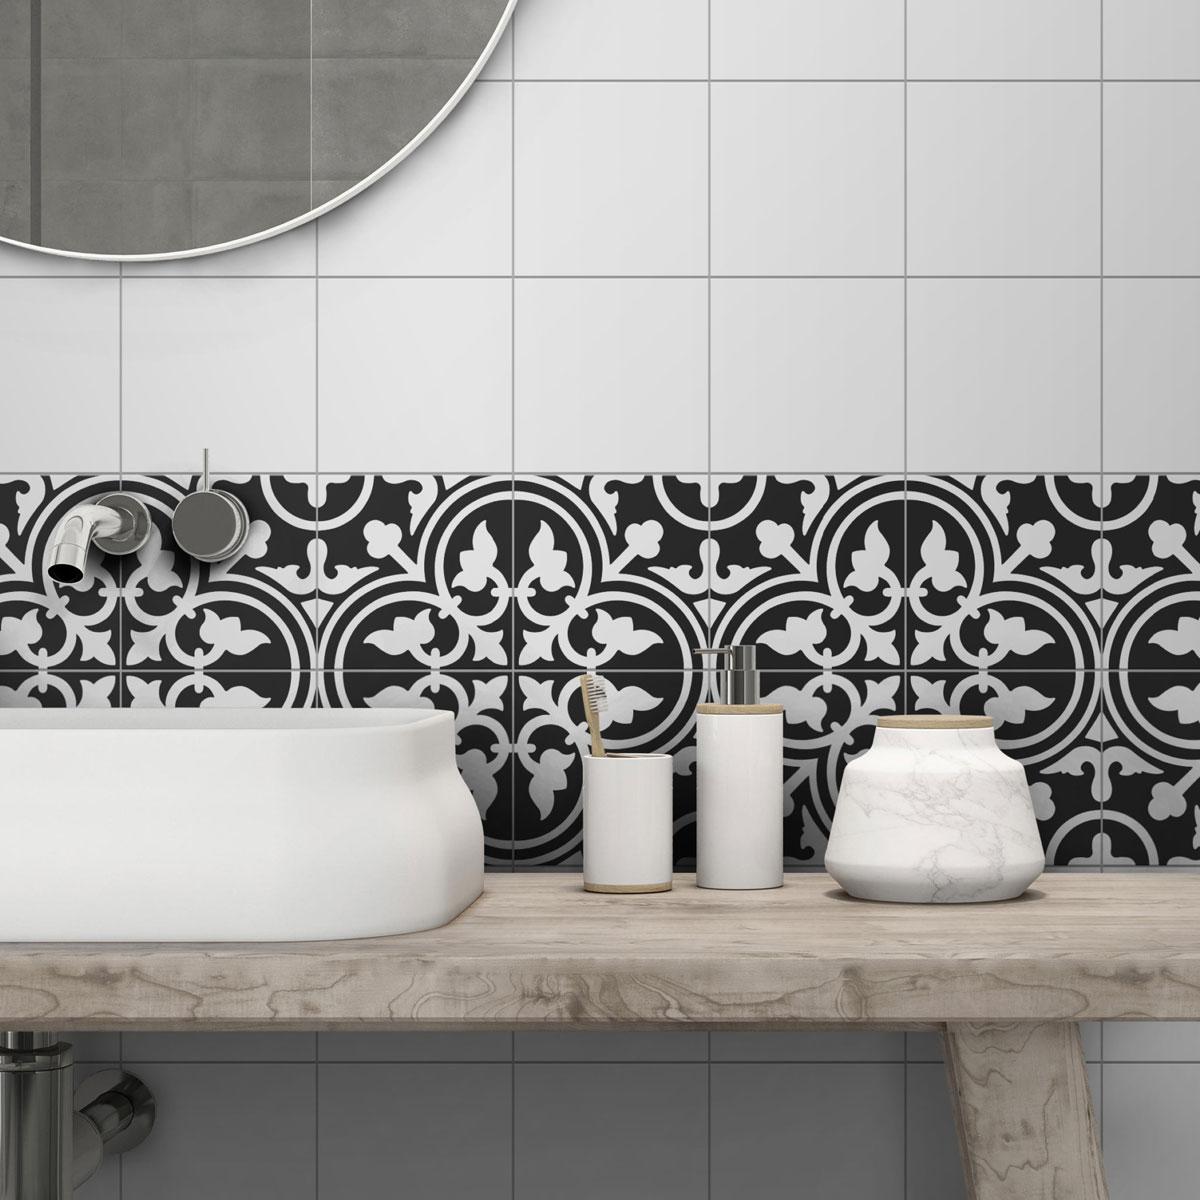 Picasso Evolution - Shadow Black - Patterned Tiles - Stone3 Brisbane